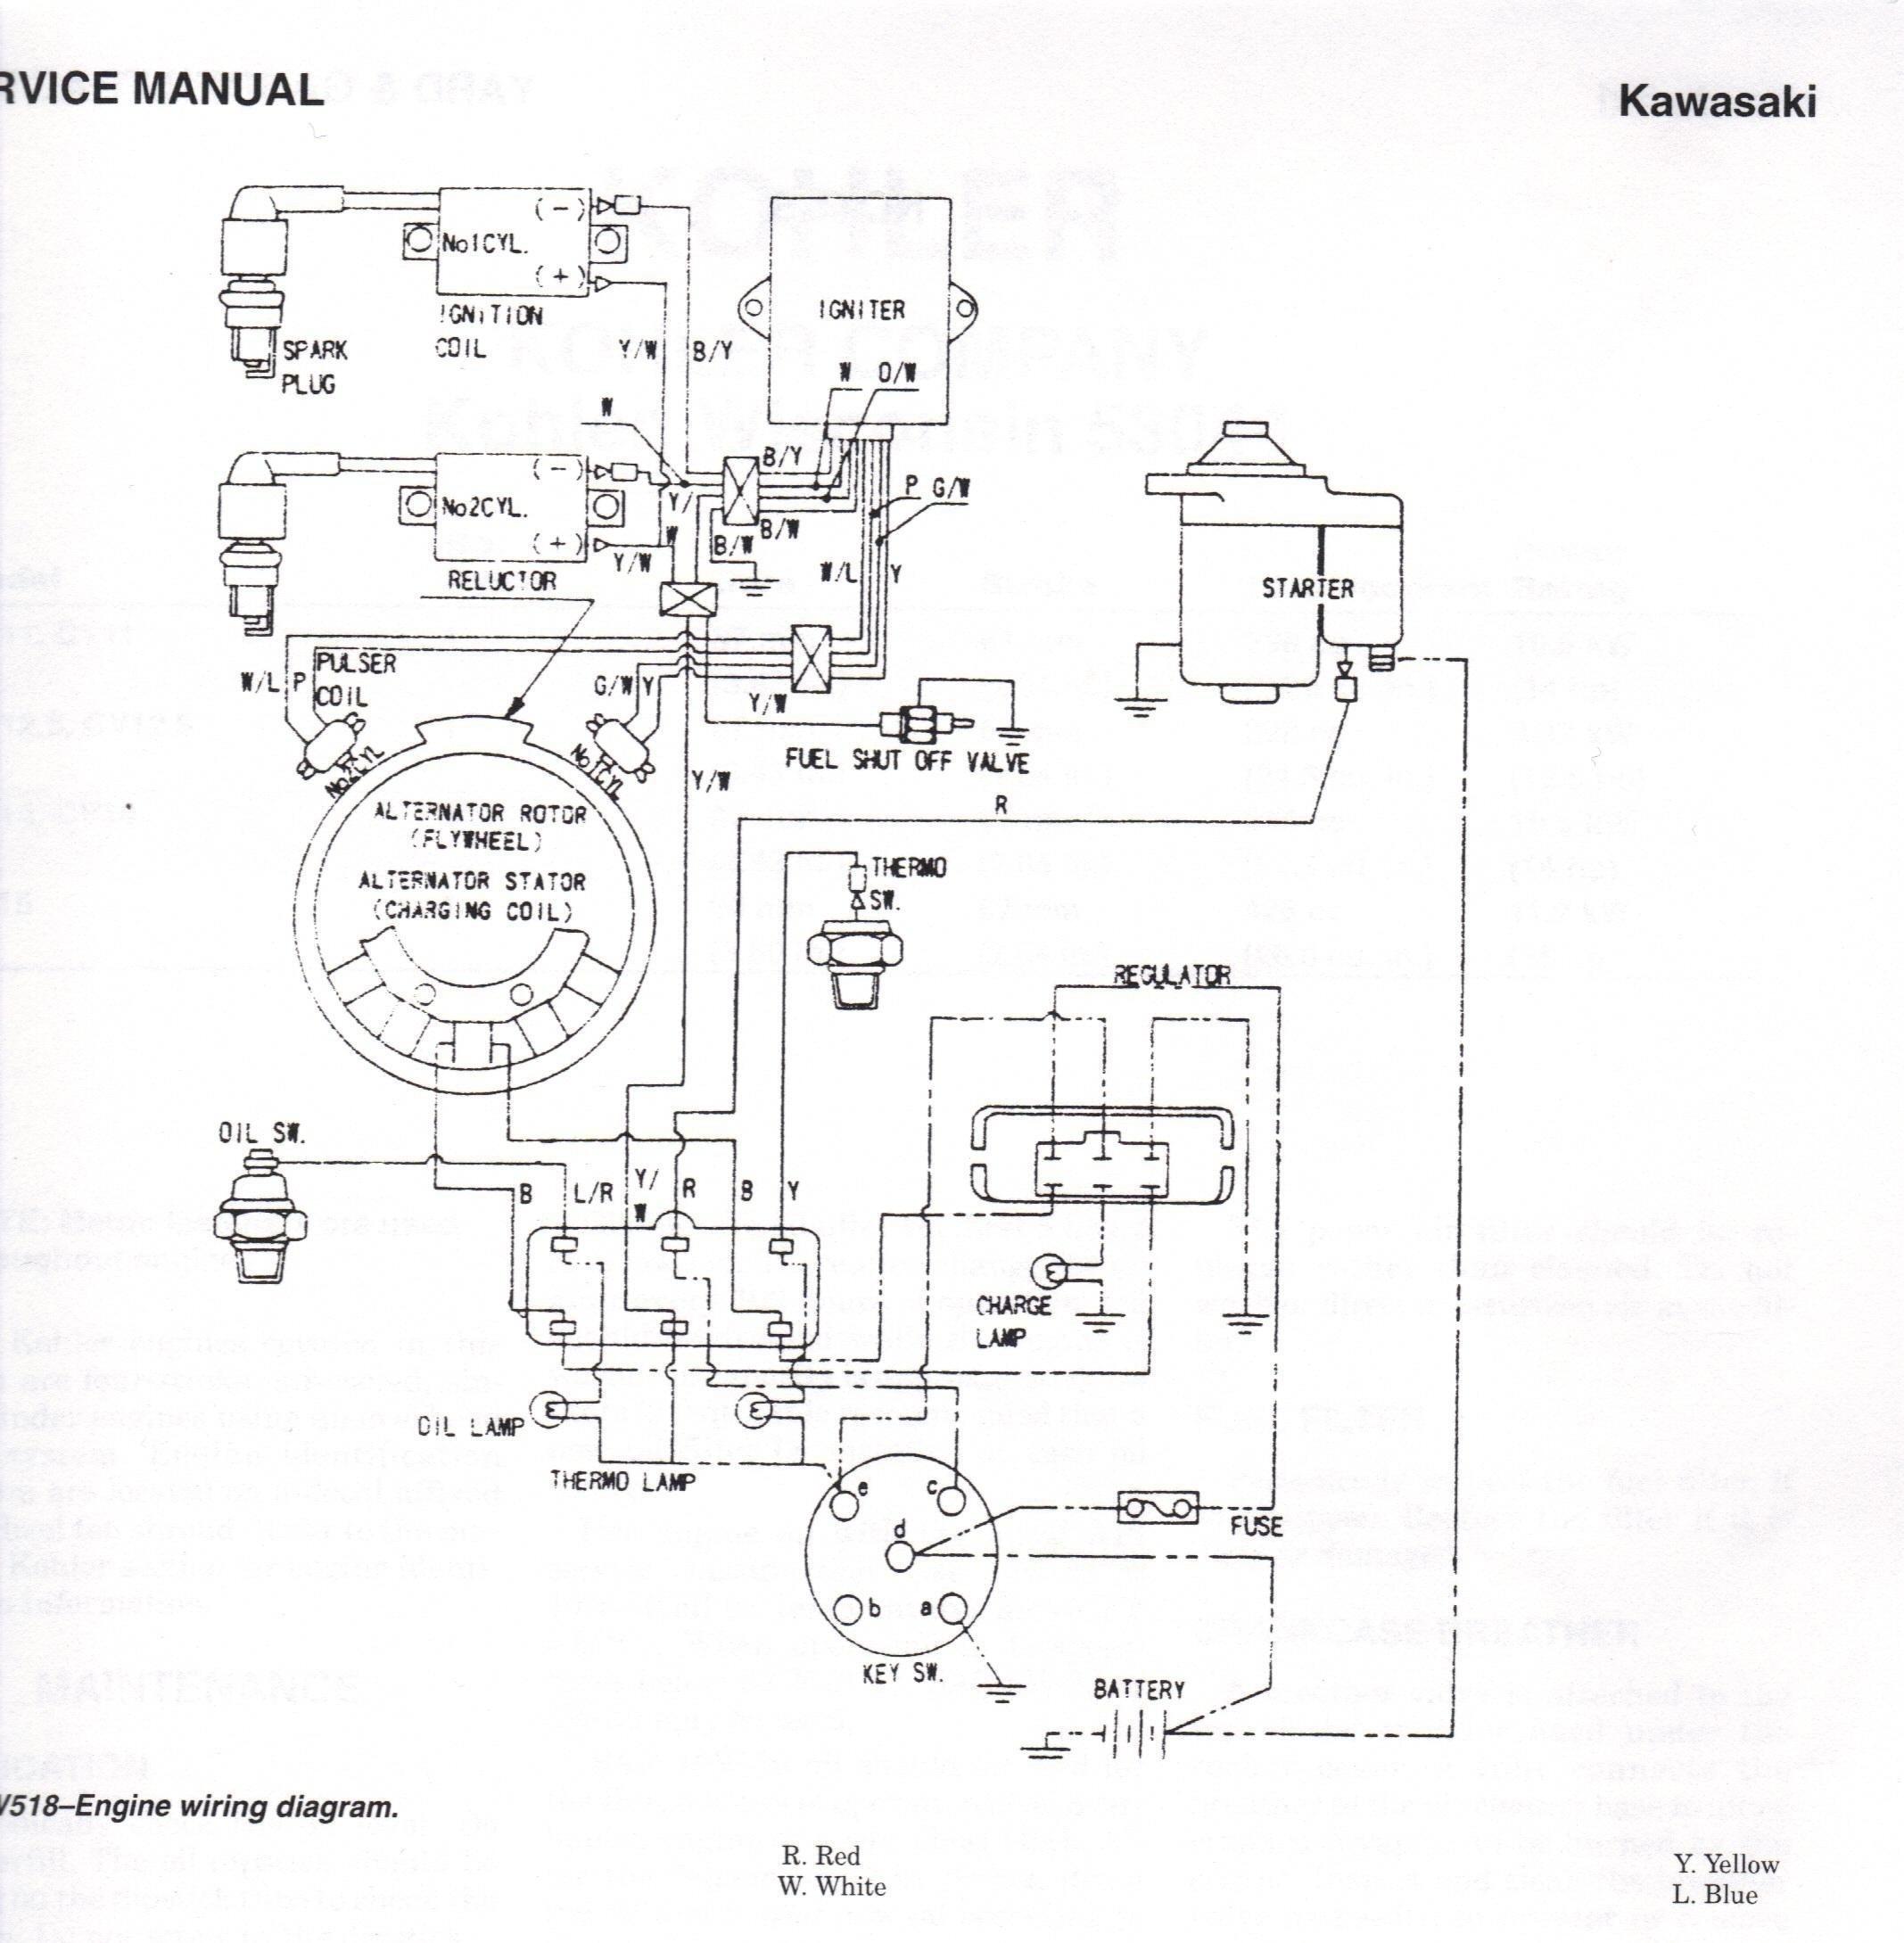 John Deere Gator 4x2 Electrical Schematic